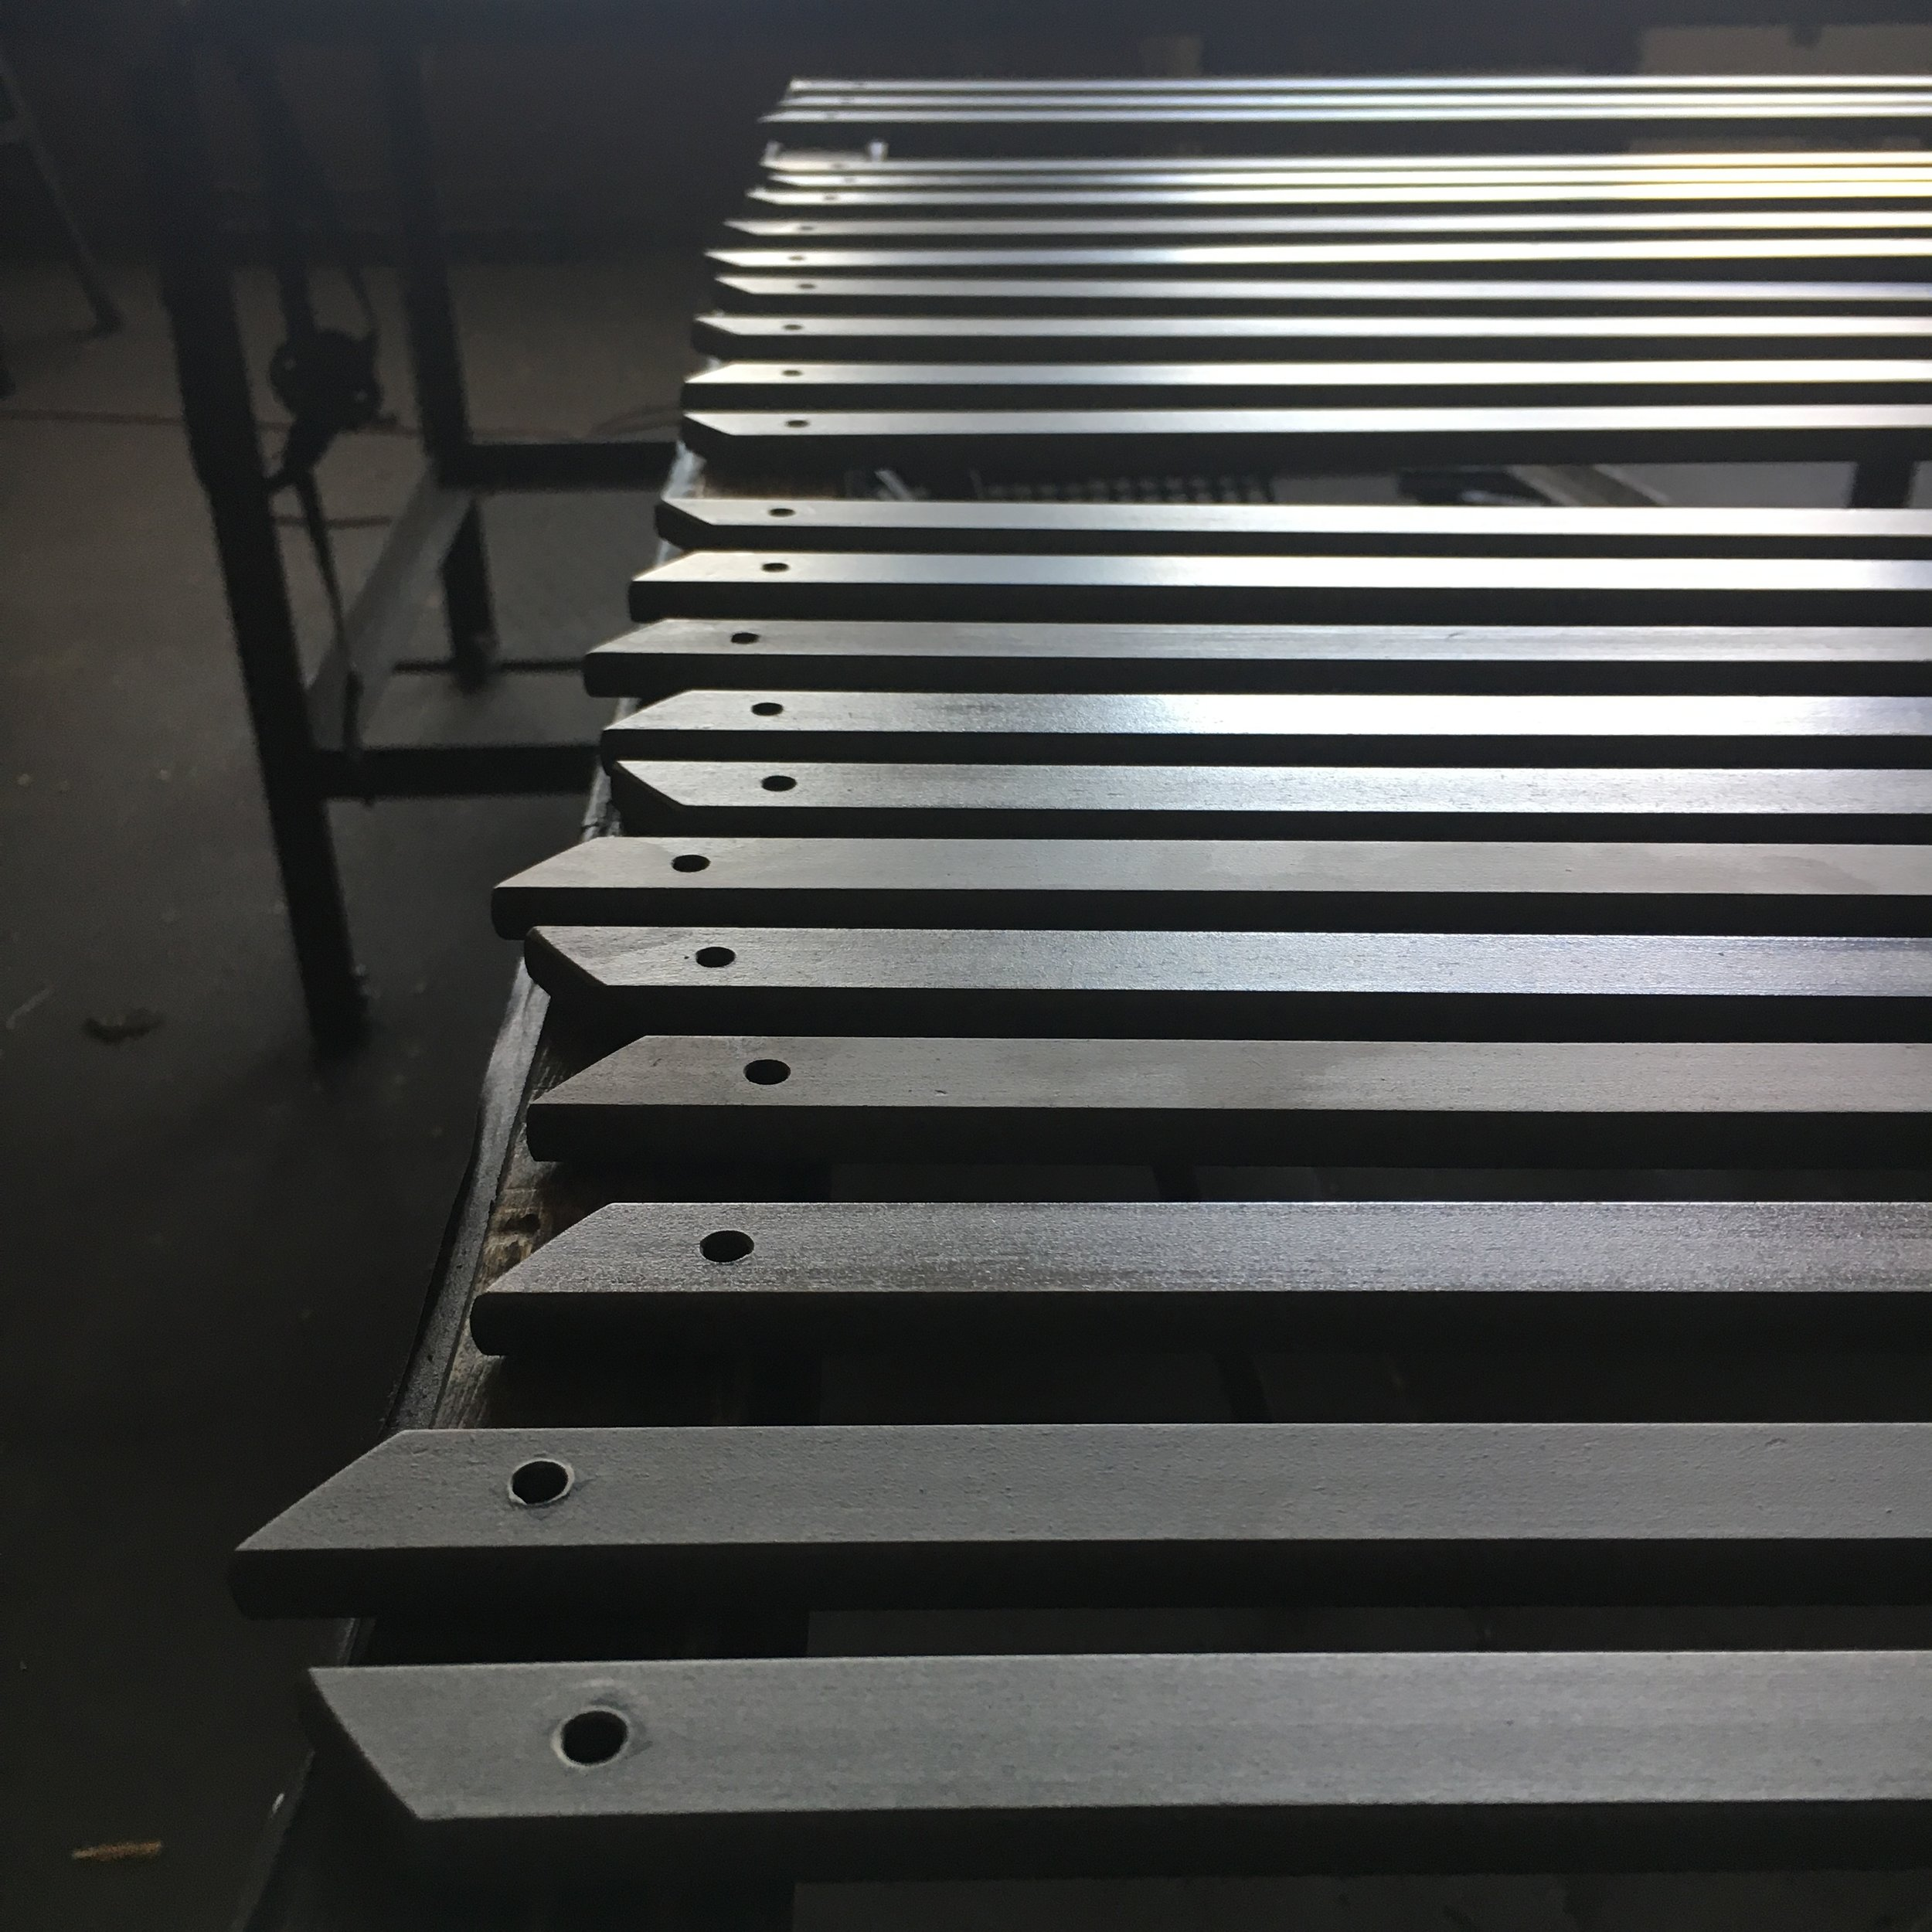 Railing parts